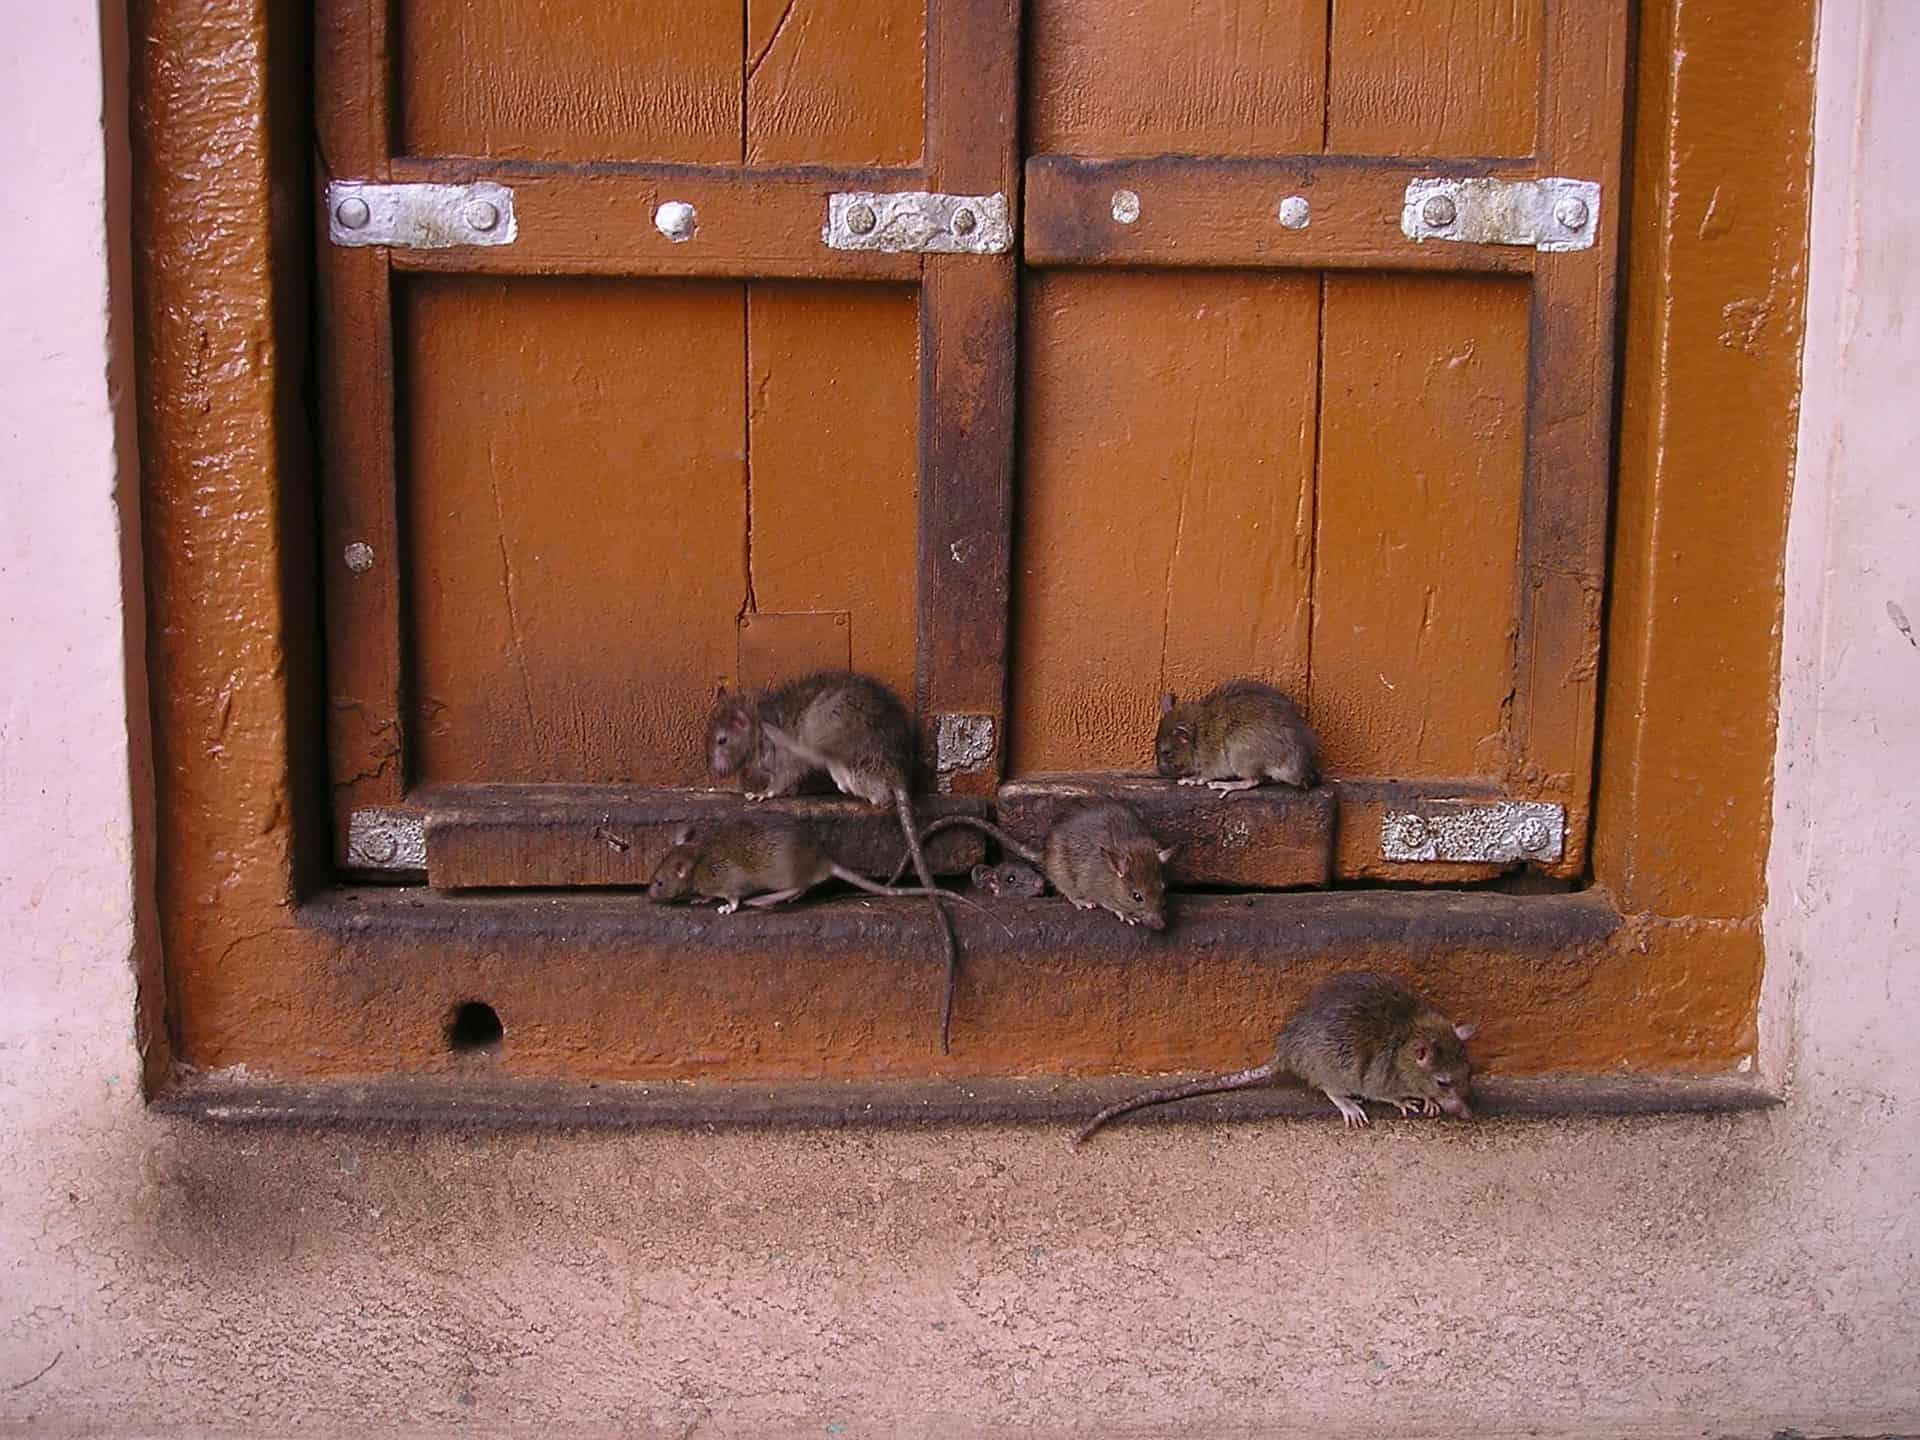 Several rats sitting on a windowsill